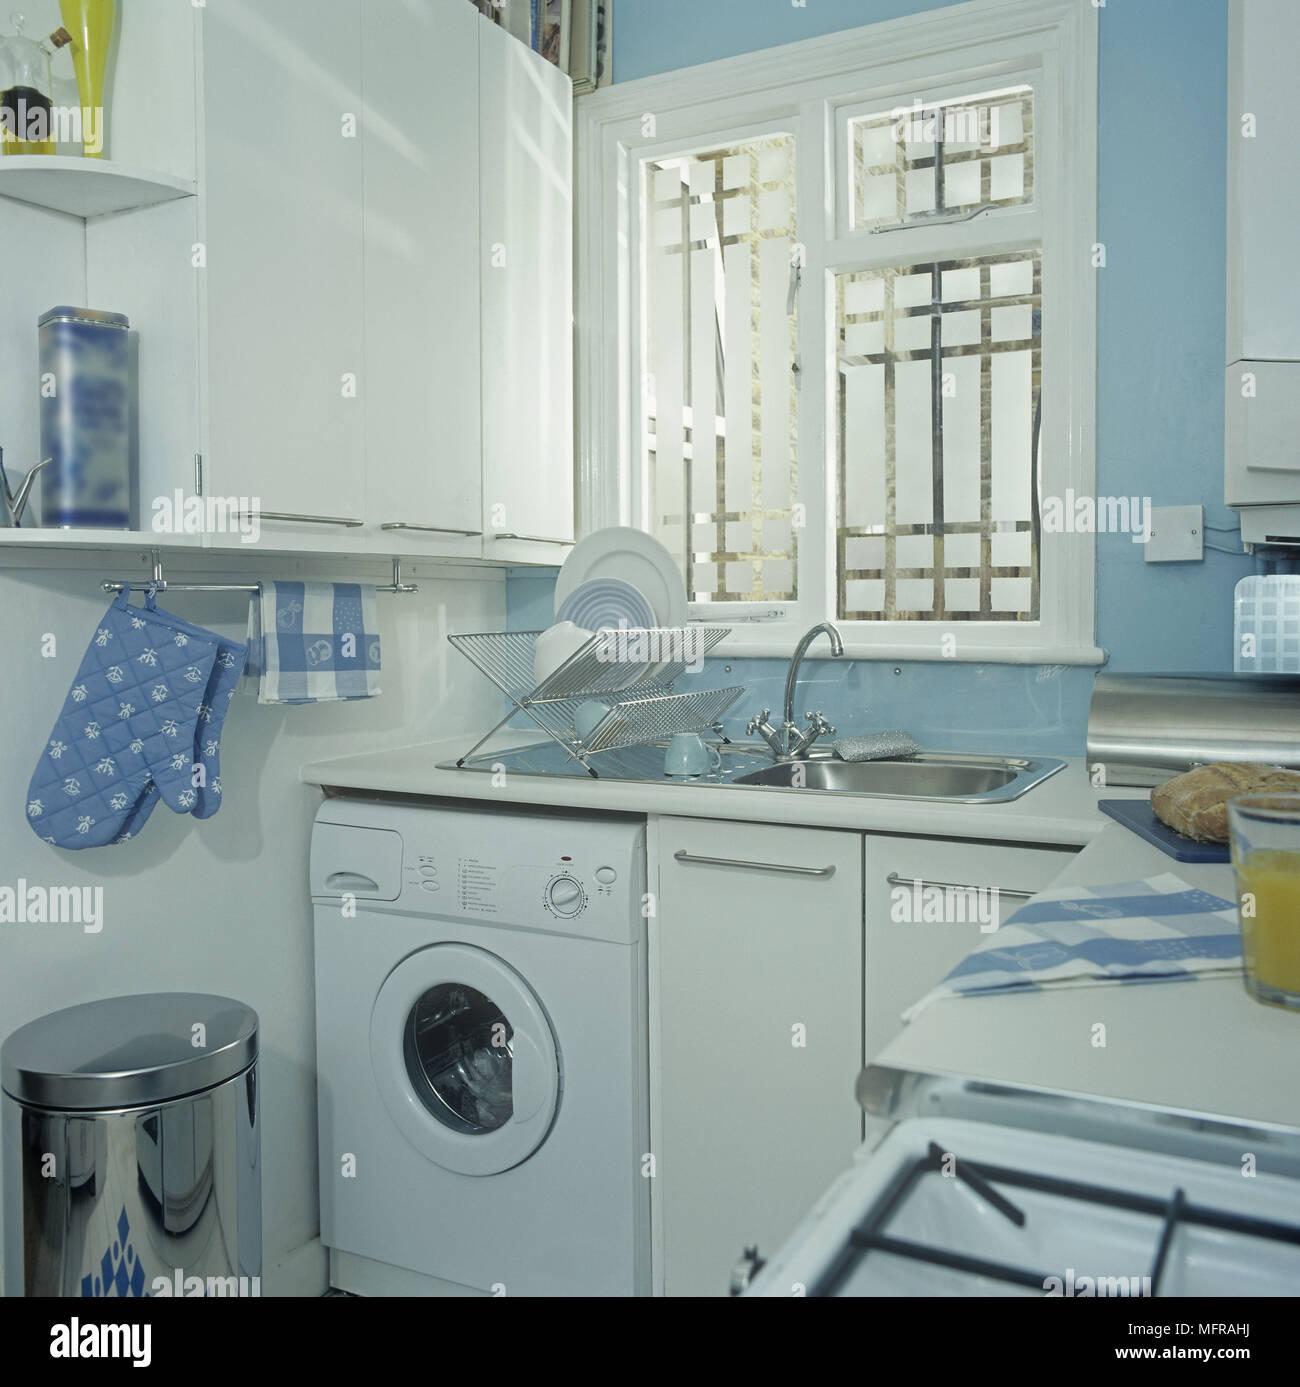 Kitchen Towel Rack Stock Photos & Kitchen Towel Rack Stock Images ...